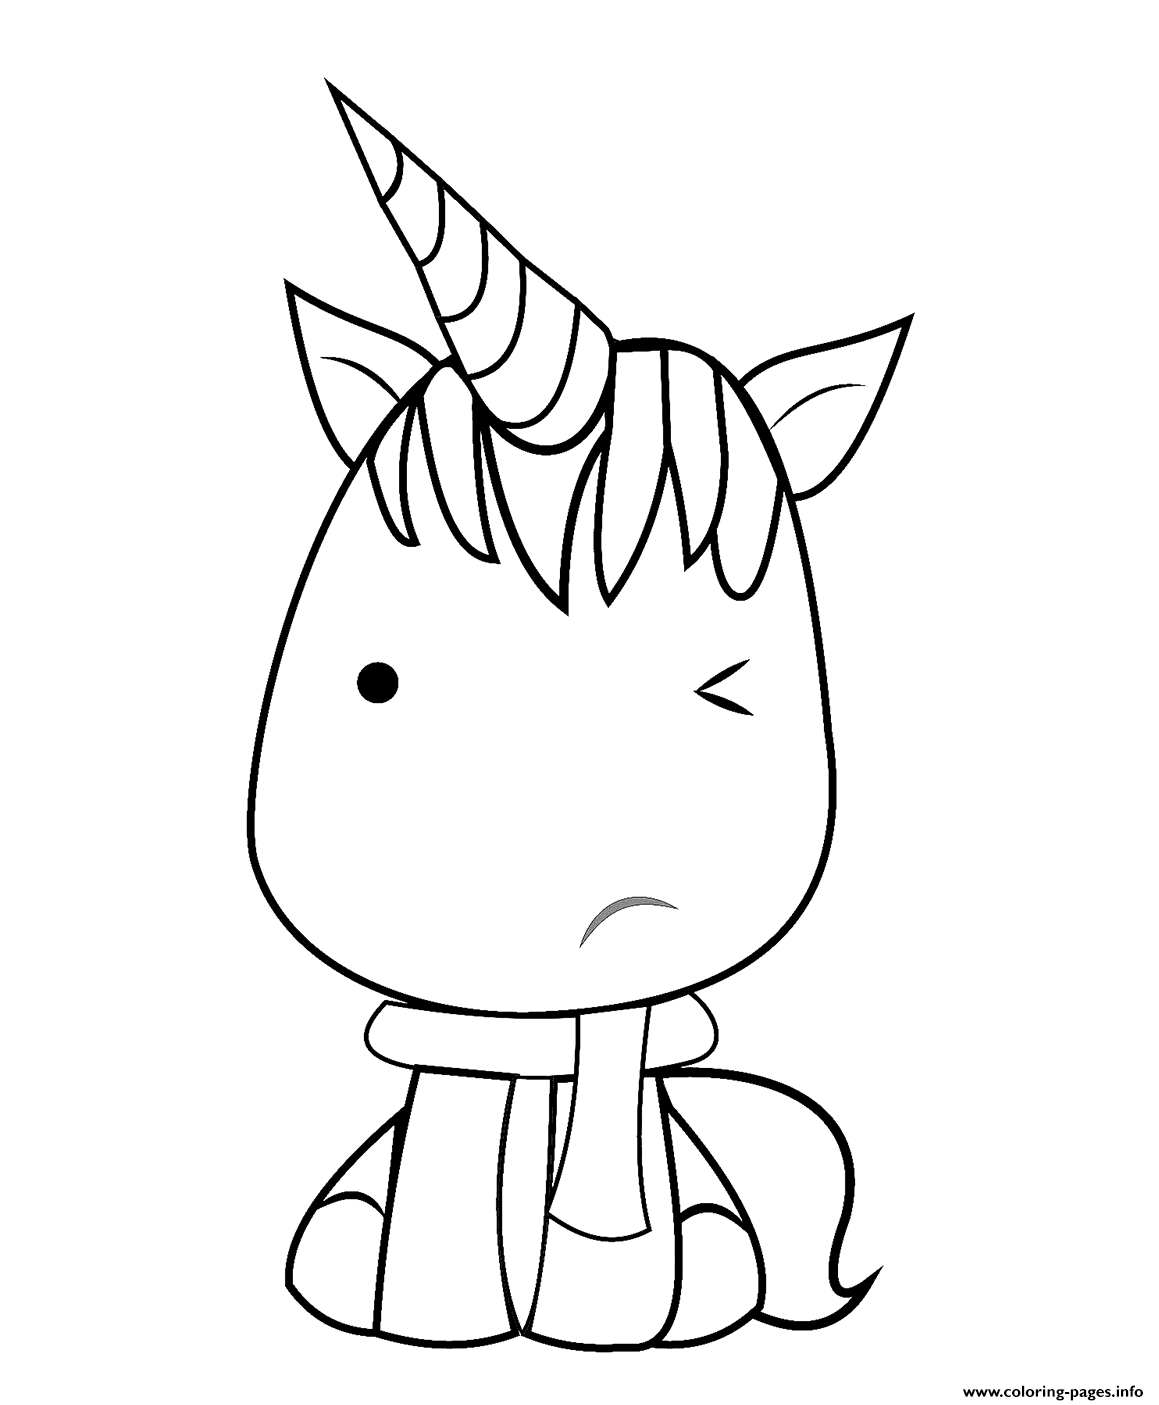 Kawaii Unicorn Coloring Page Coloring Pages Printable